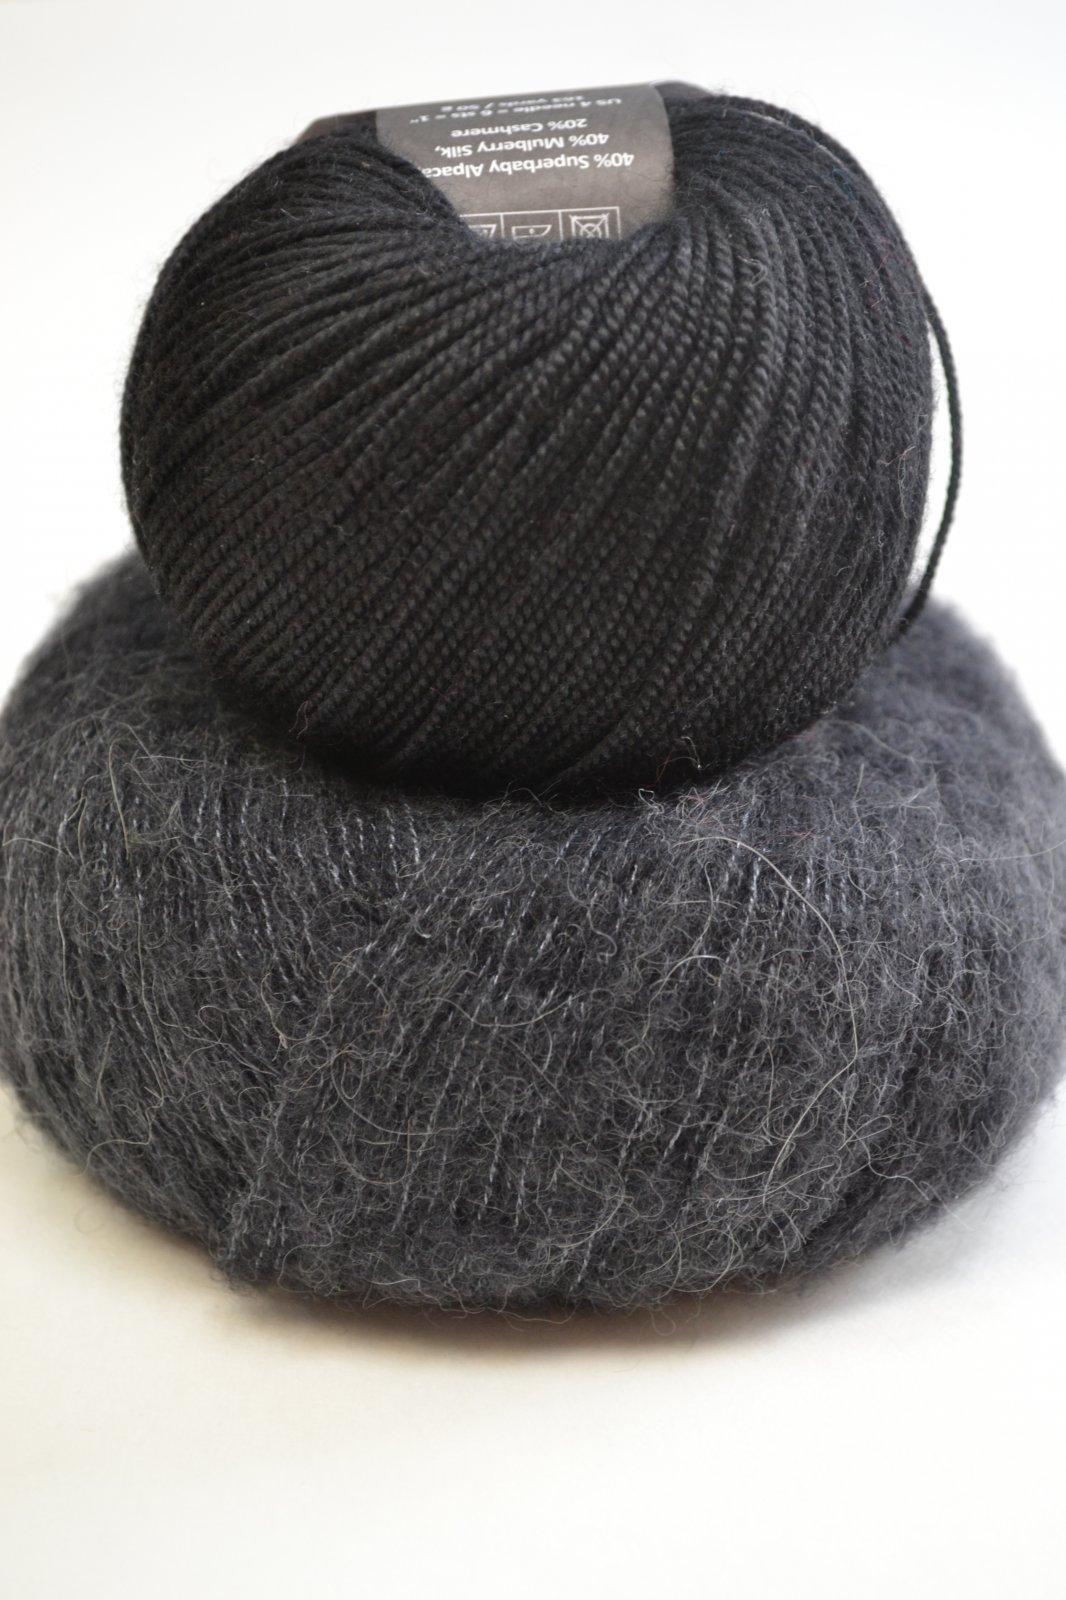 Profiterole Hat Kit